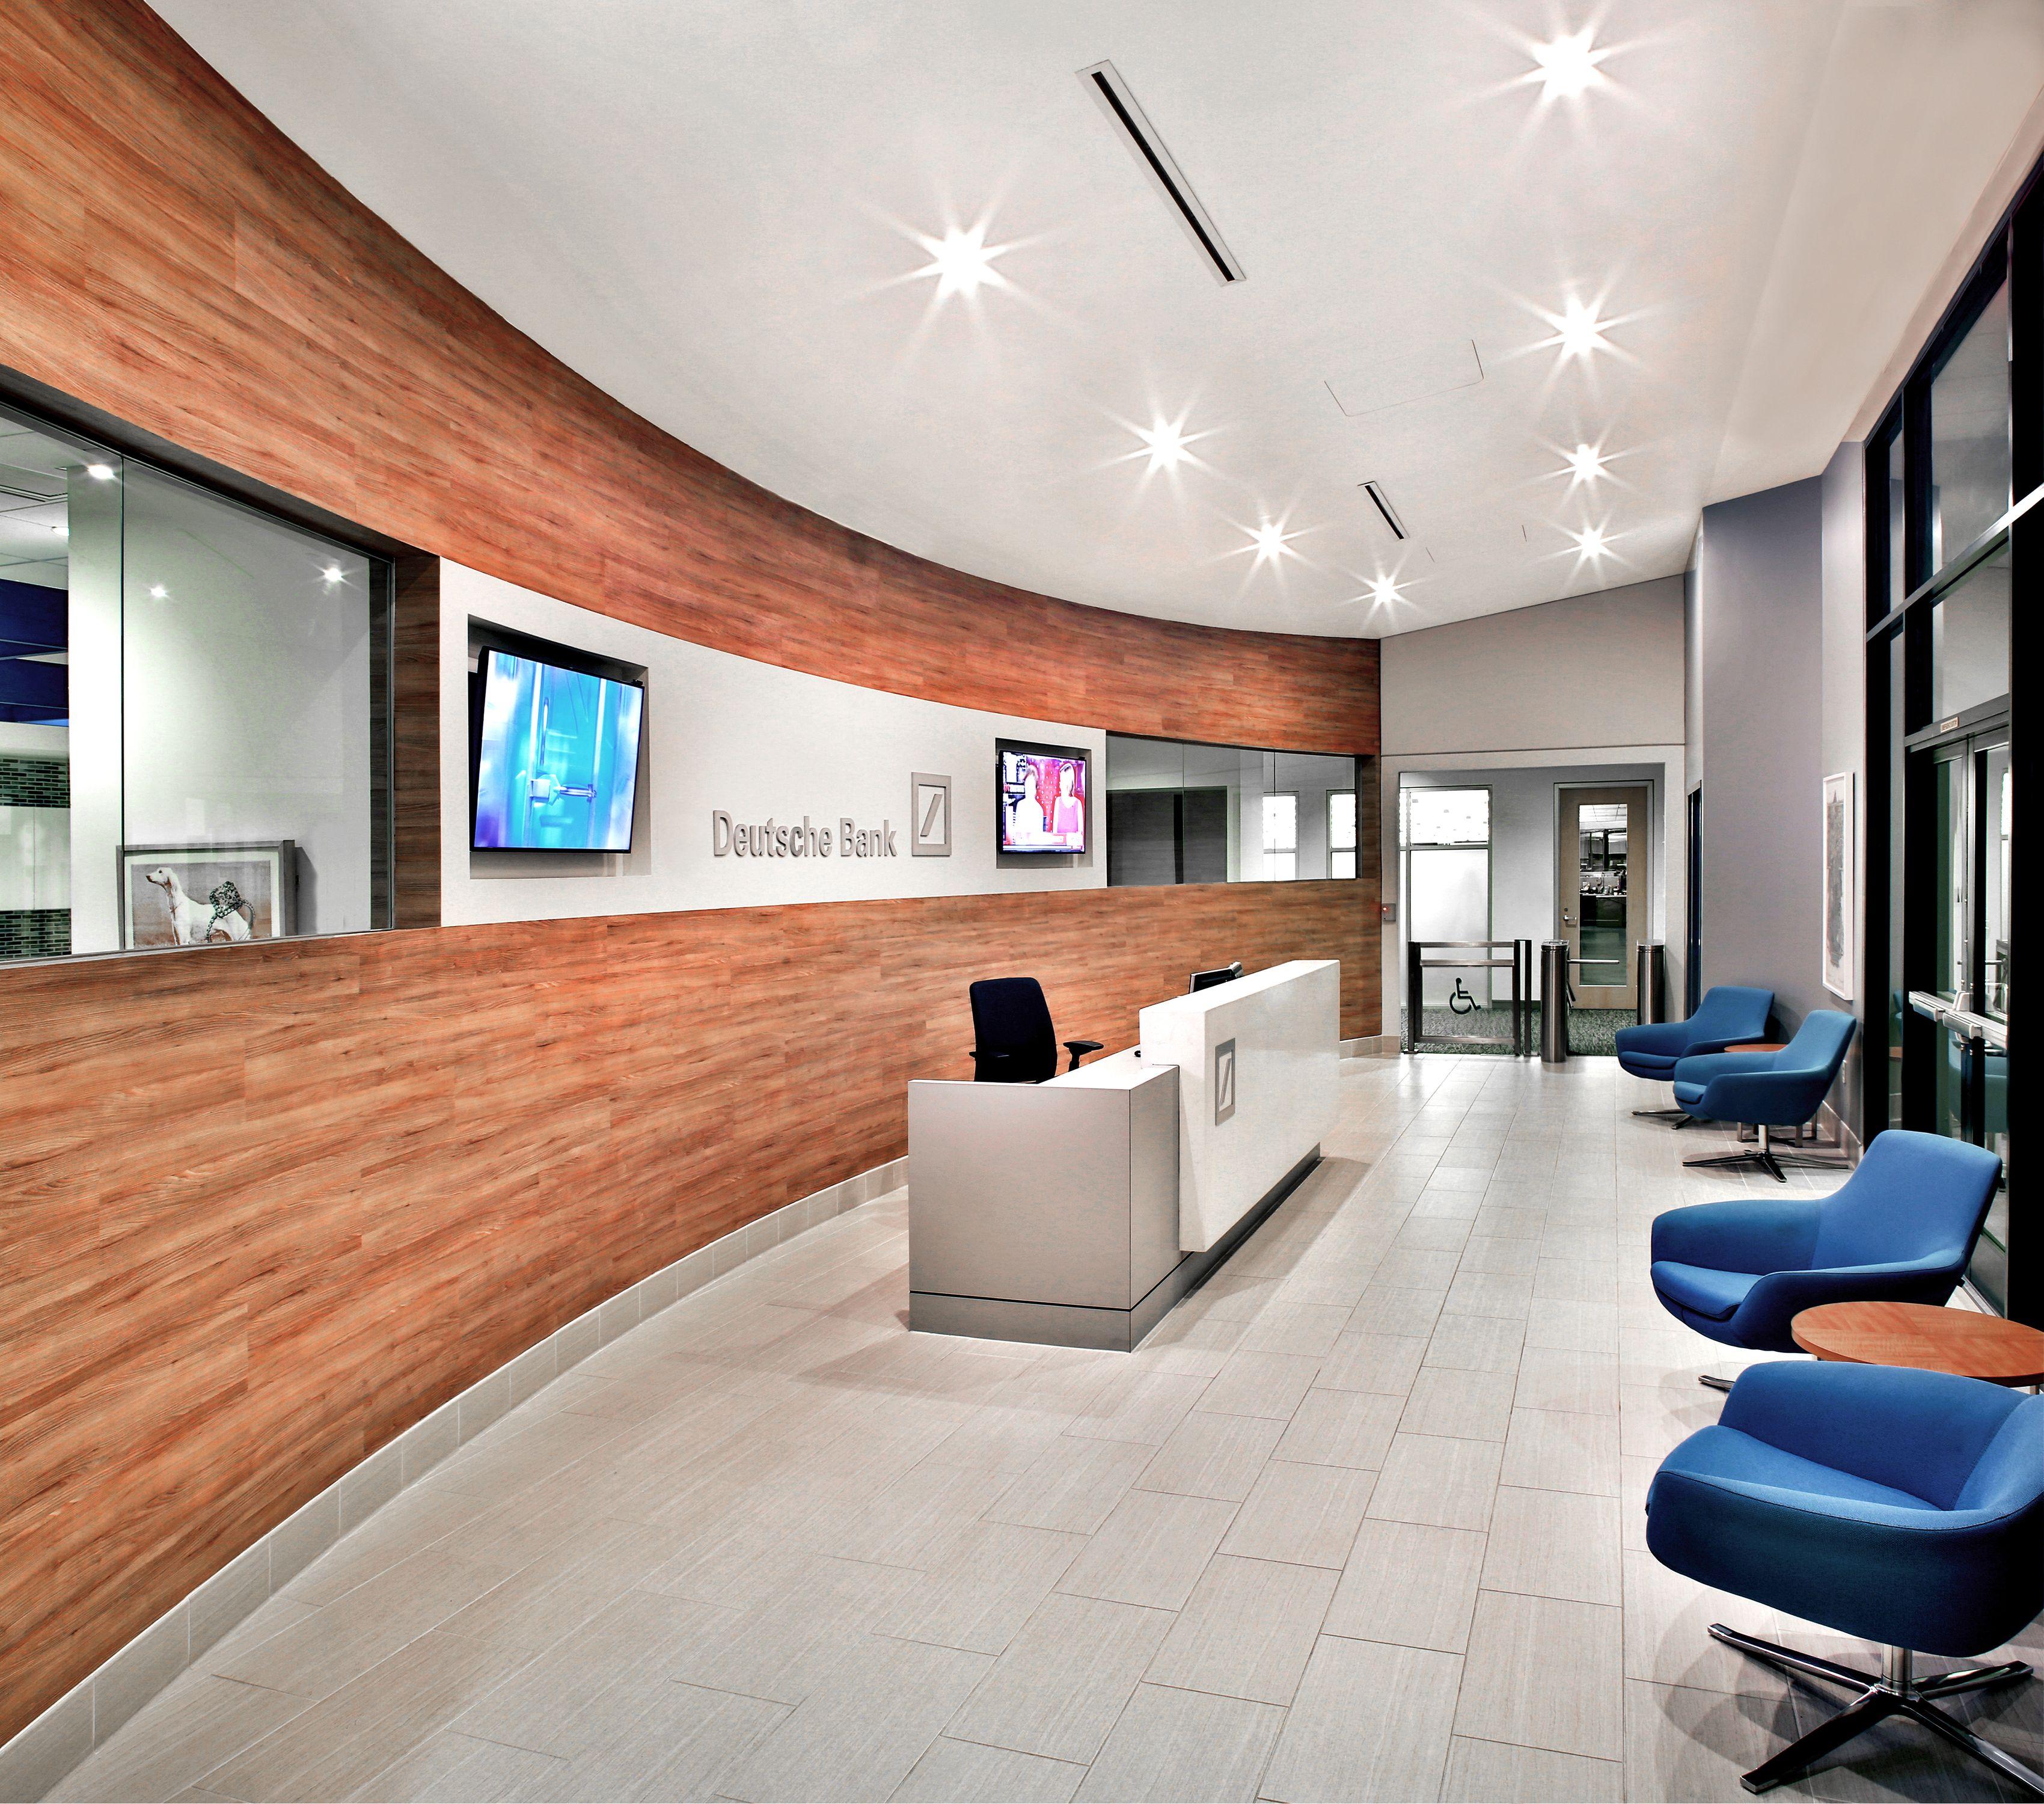 Deutsche Bank - 400-Lobby copy 2.jpg